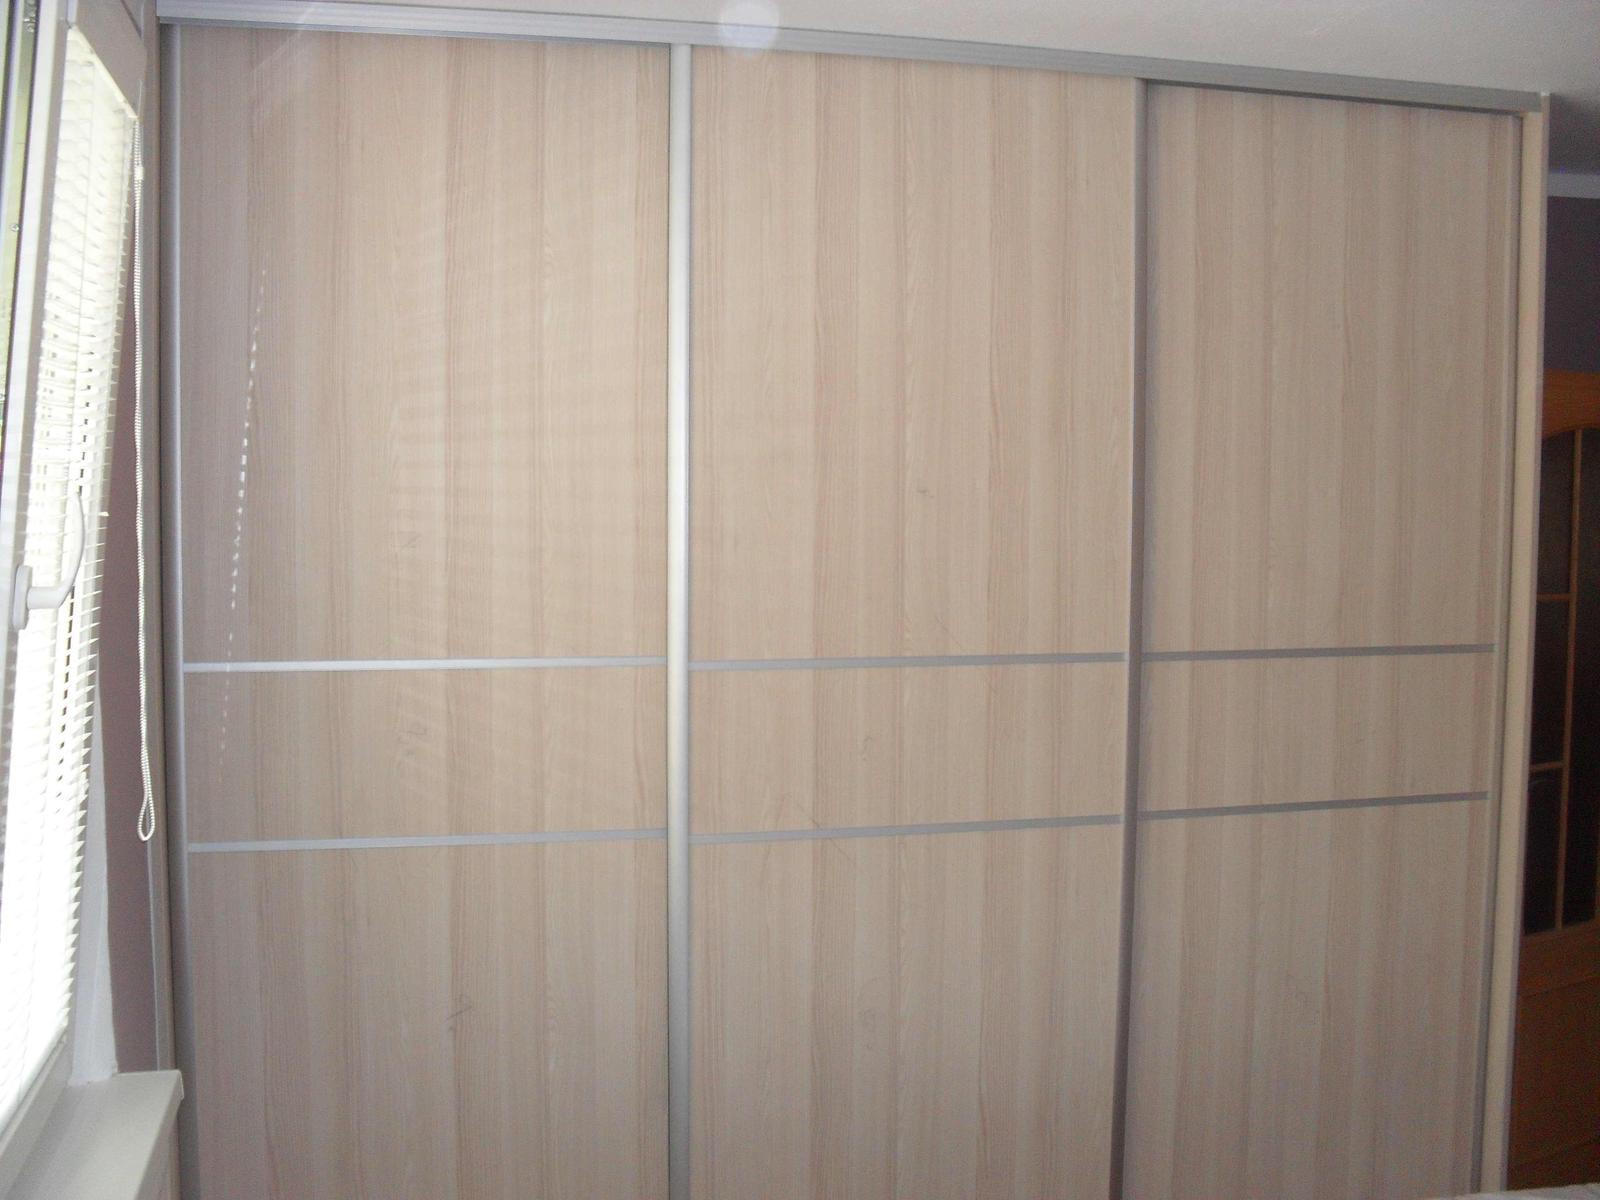 Vstavané skrine Martin Benko Bošany - Obrázok č. 15